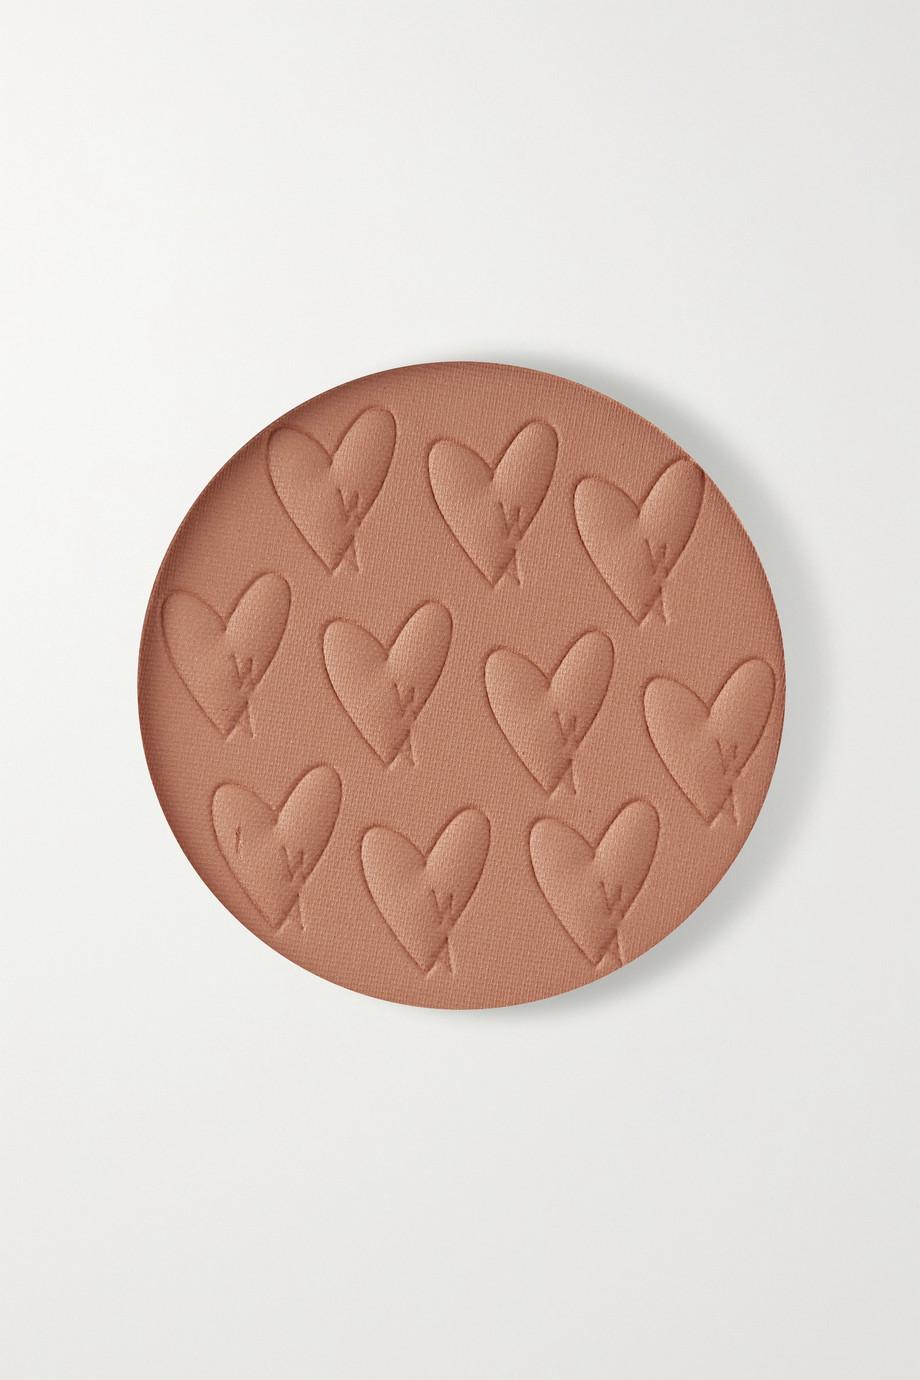 Westman Atelier Beauty Butter Powder Bronzer - Coup de Soleil